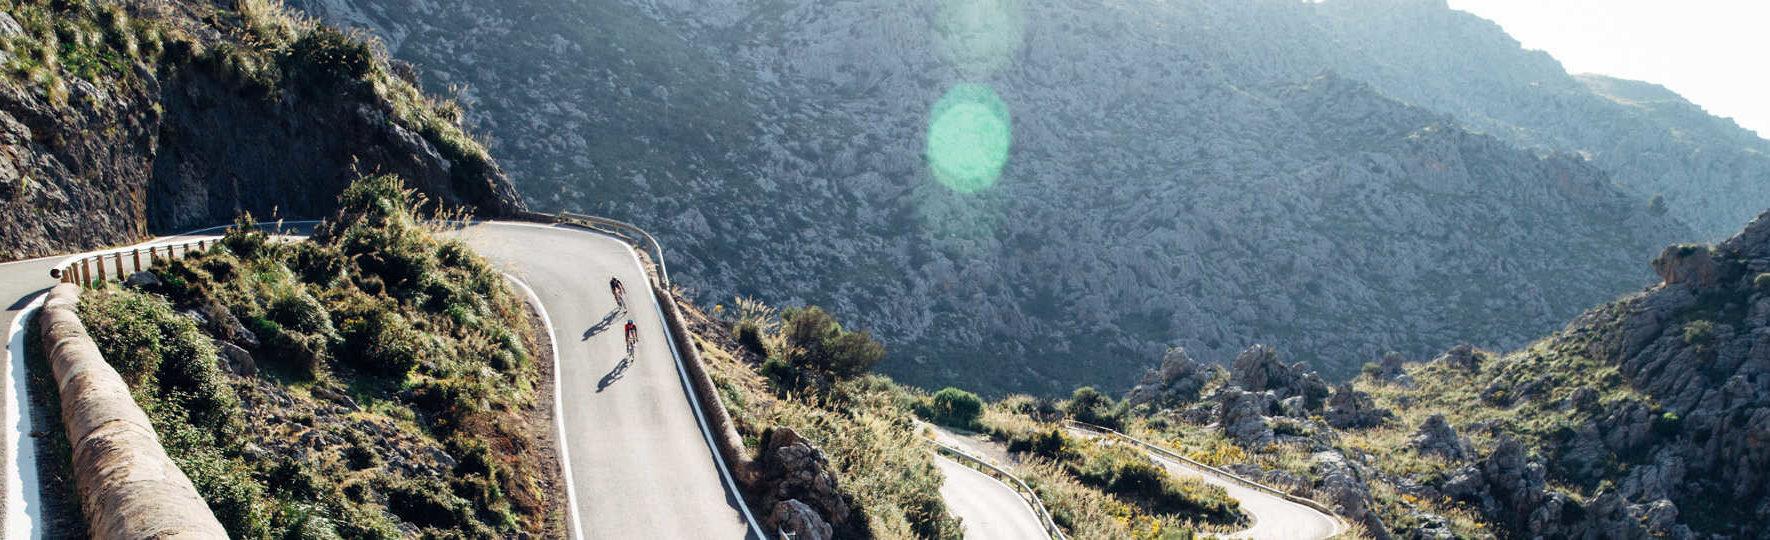 trek bicycle IOT